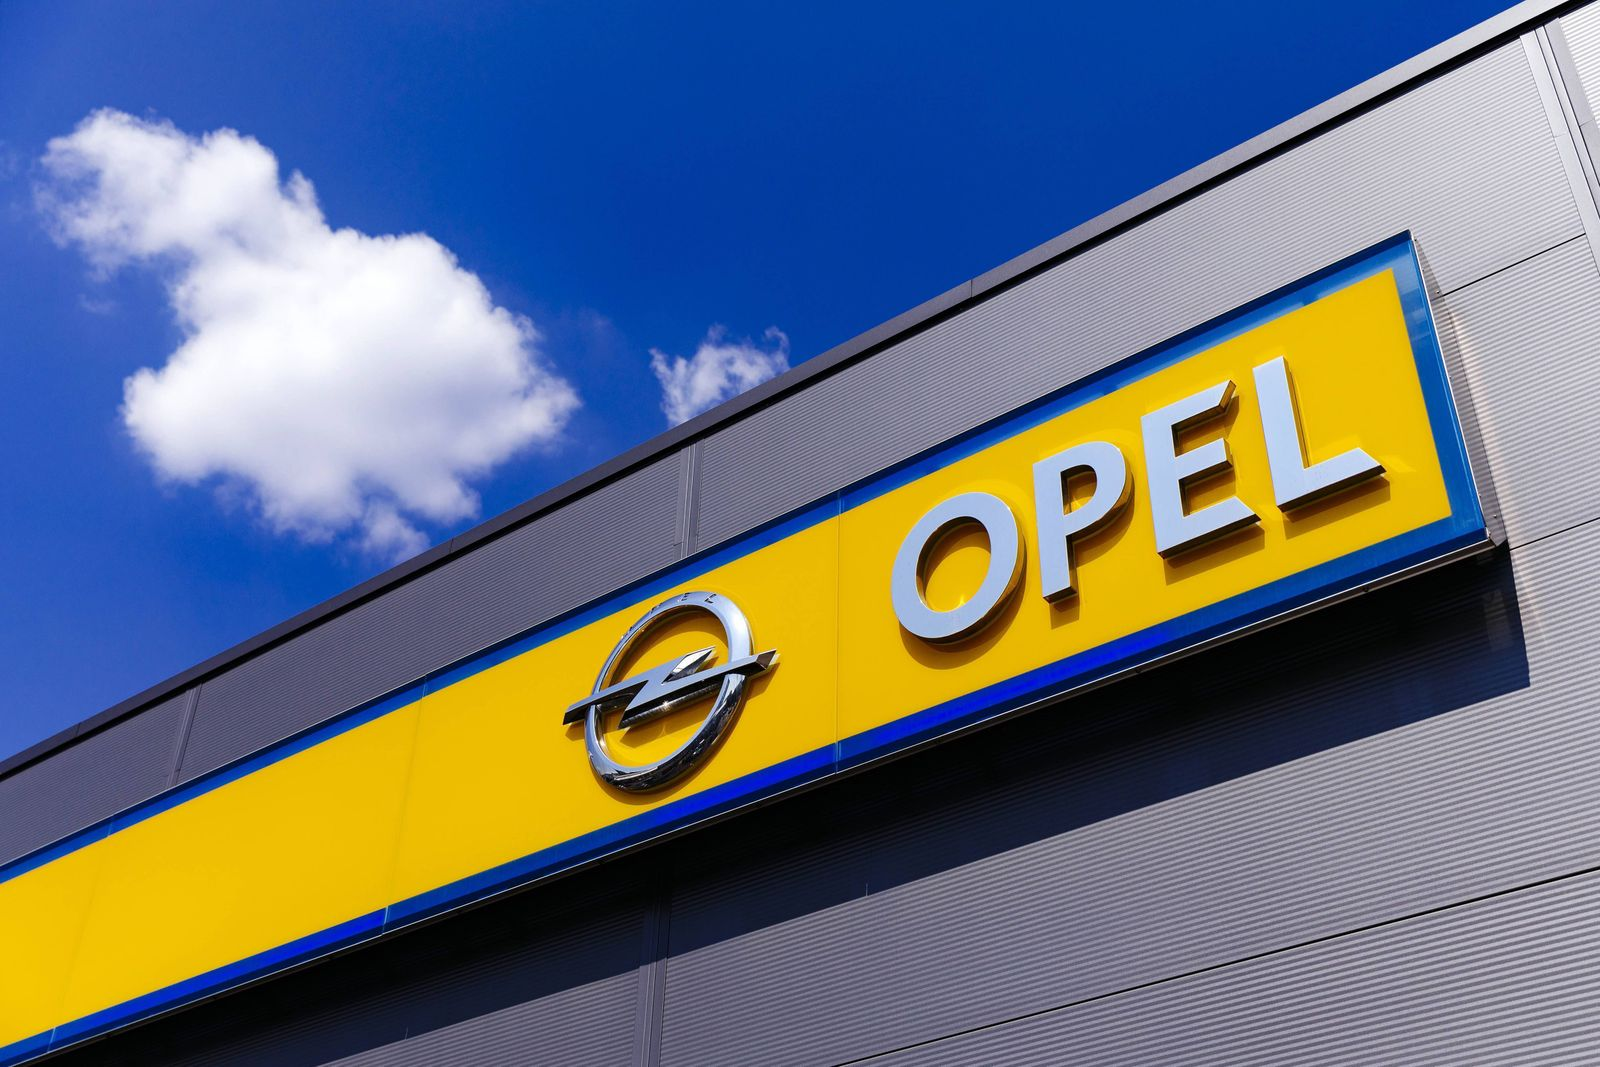 Ein Opel-Händler in Ehrenfeld. Köln, 19.07.2018 *** An Opel dealer in Ehrenfeld Cologne 19 07 2018 Foto:xC.xHardtx/xFut